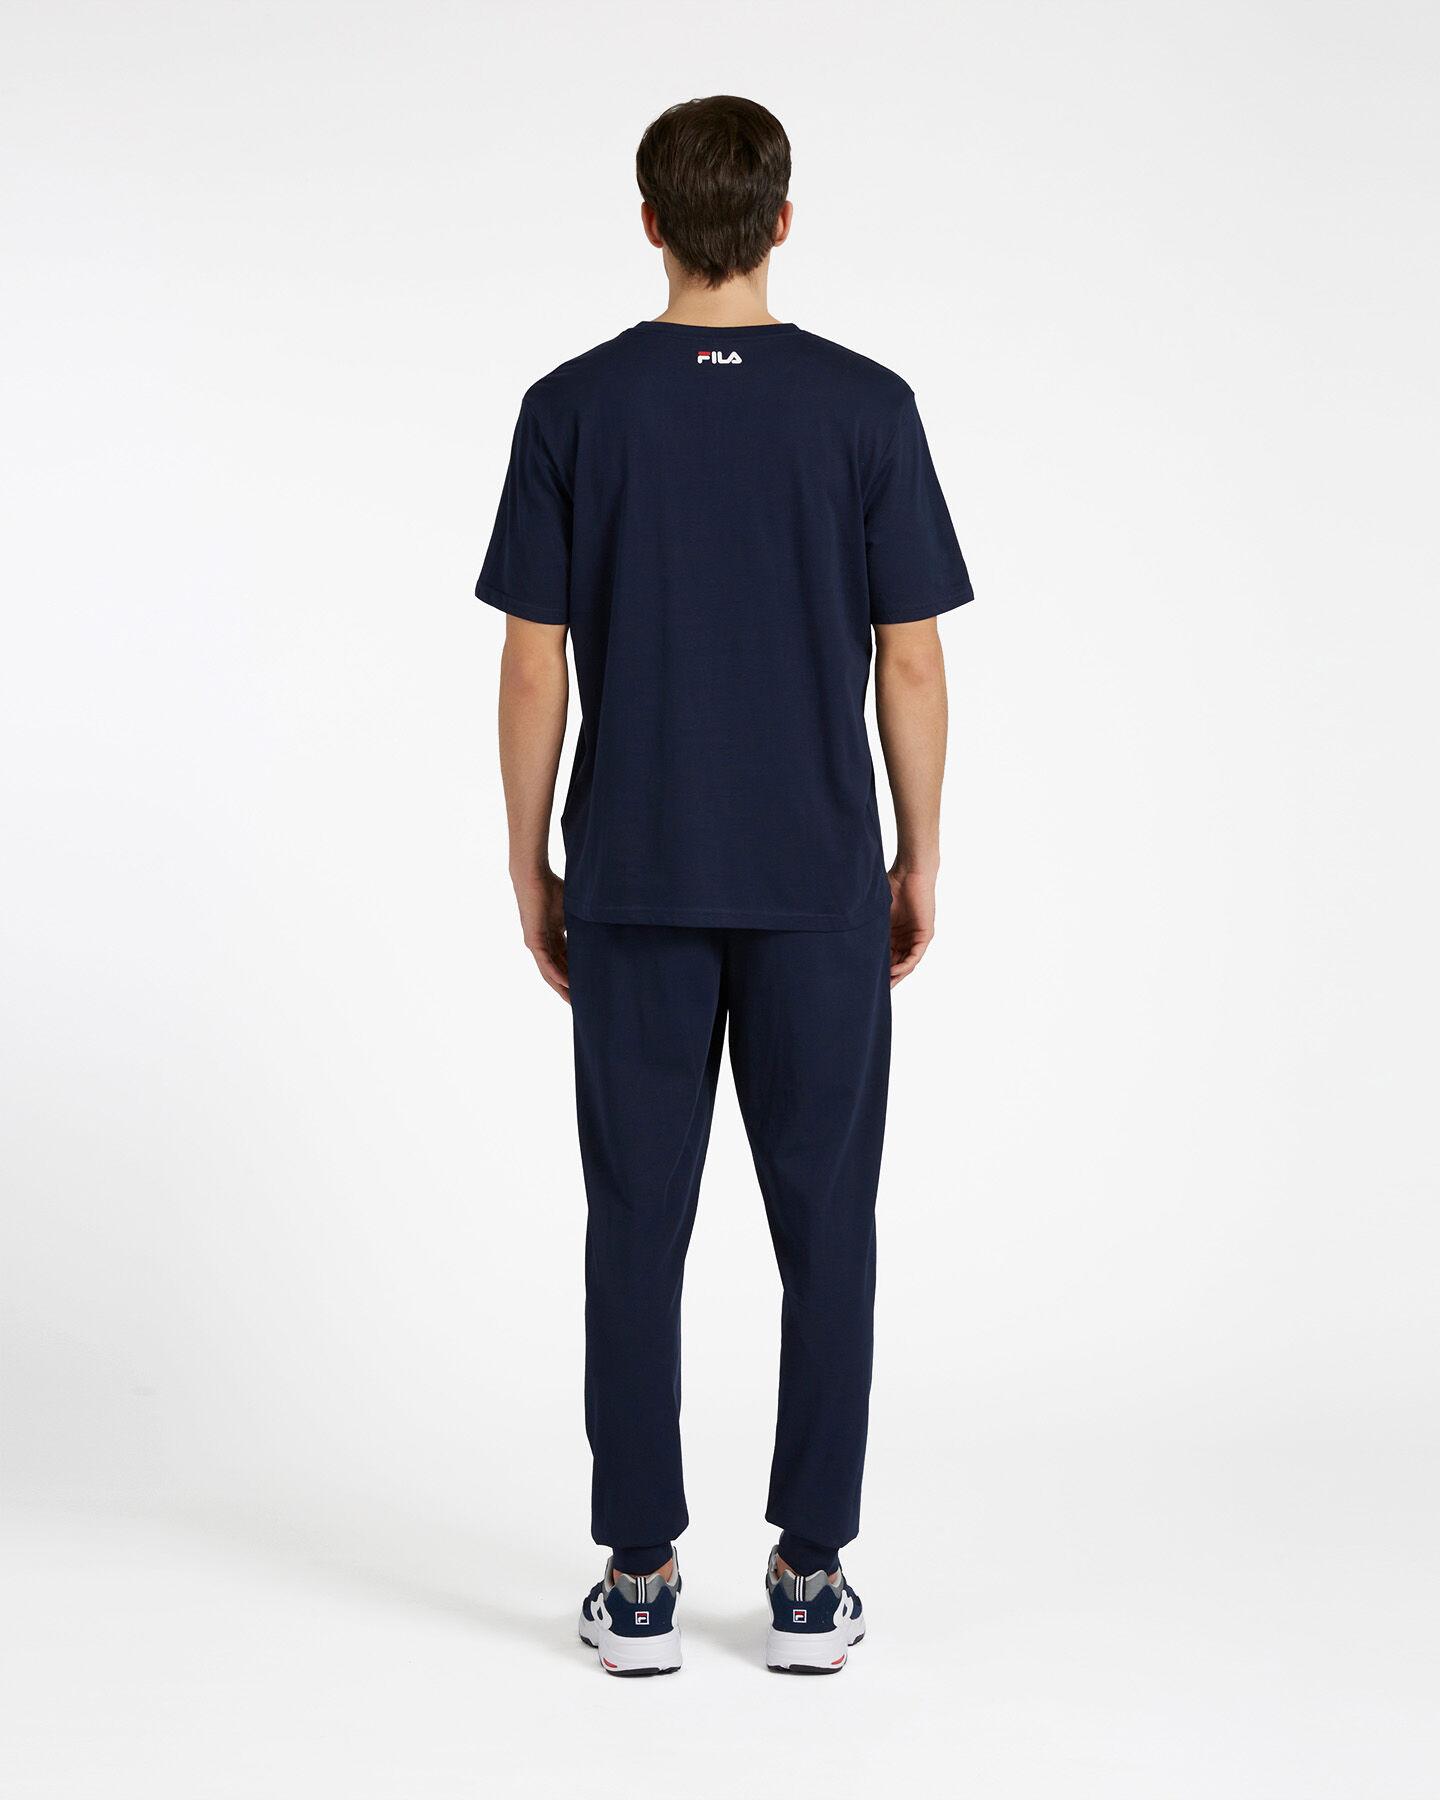 T-Shirt FILA LOGO VINTAGE M S4088402 scatto 2